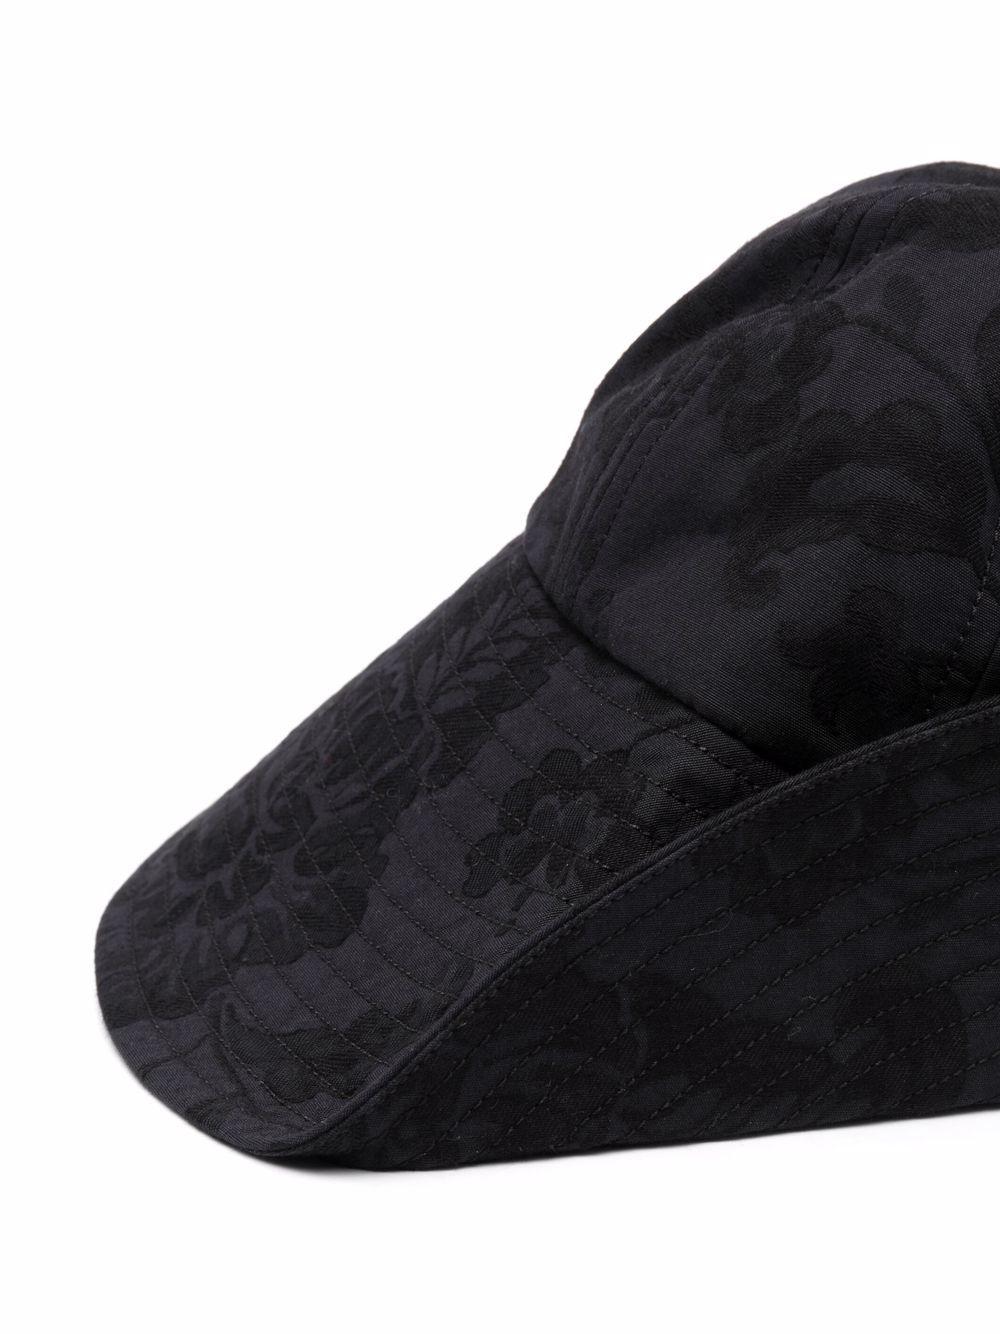 ERDEM | Hat | 1445BTCJBLACK